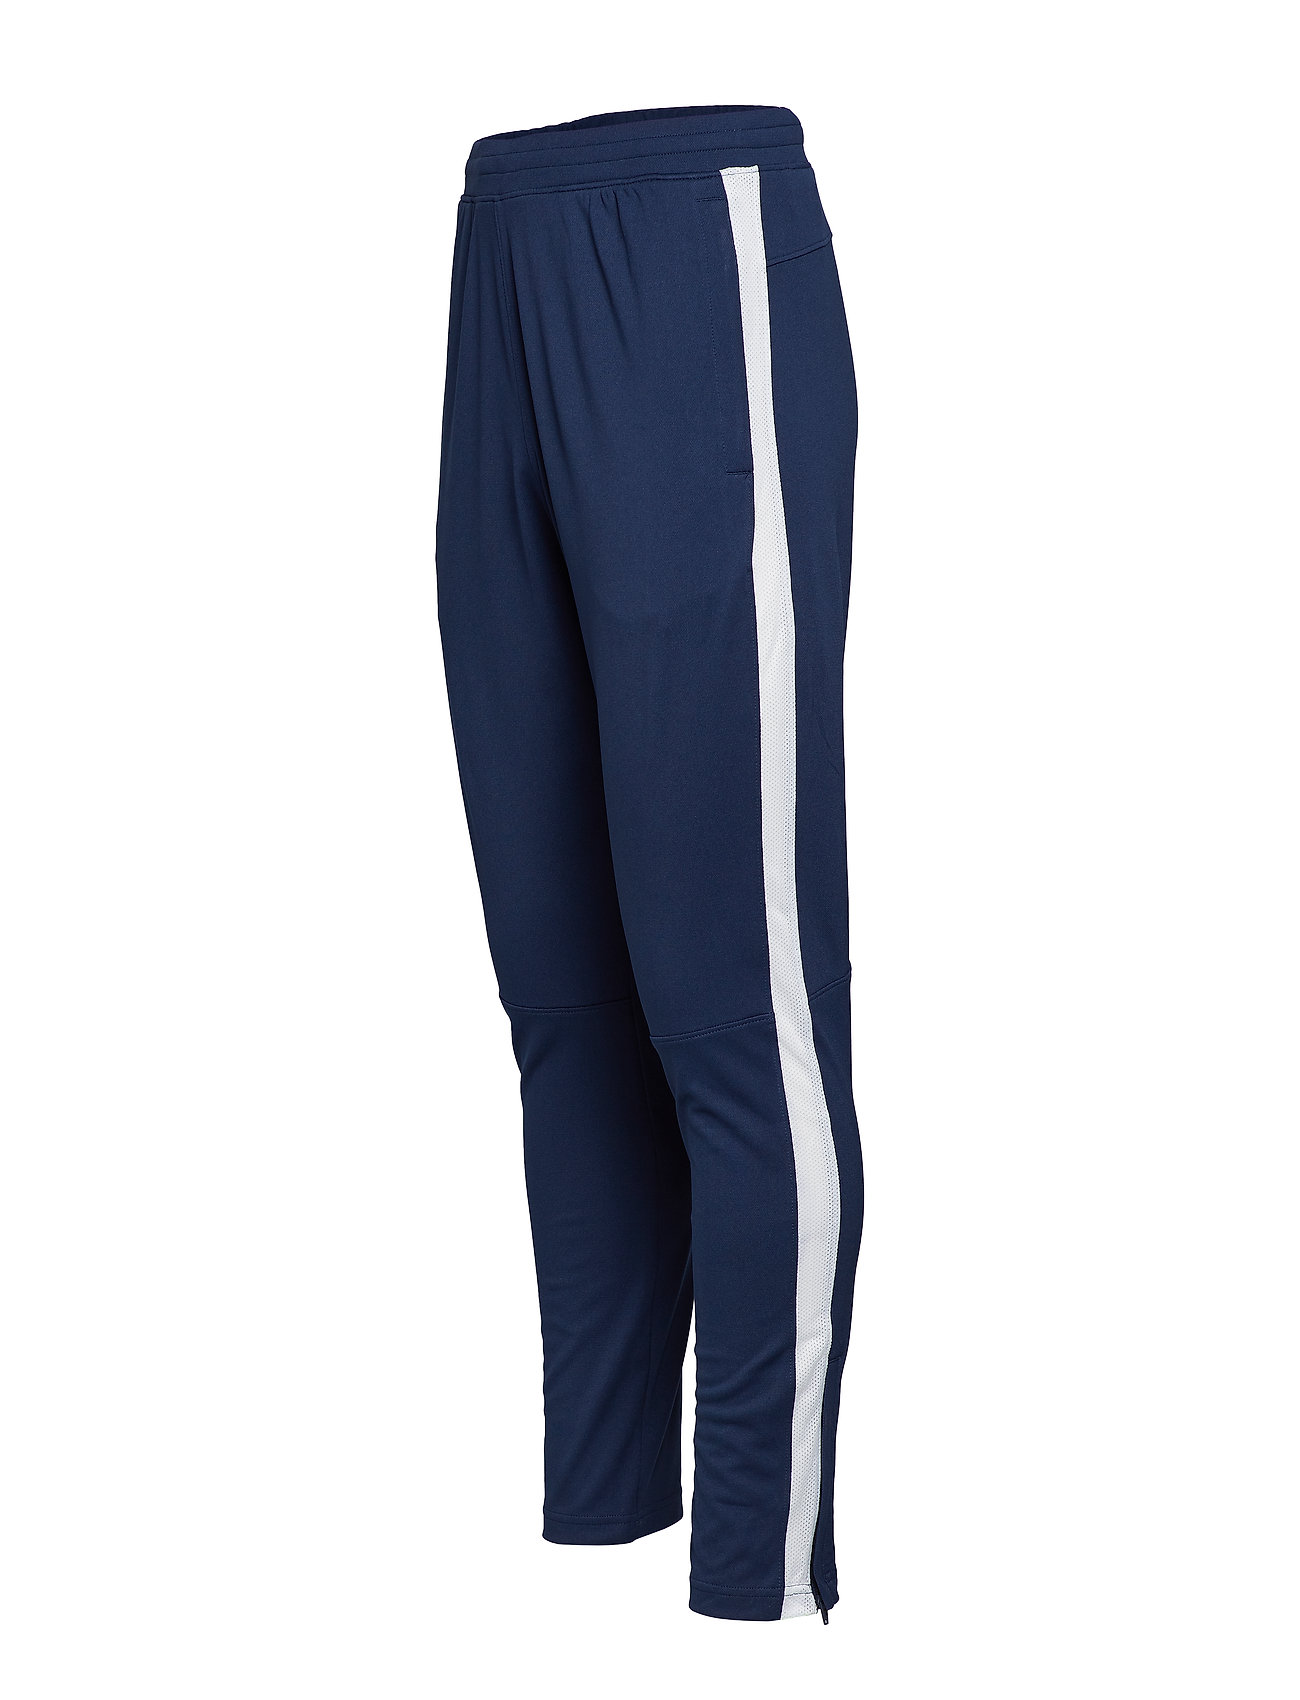 Under Armour - SPORTSTYLE PIQUE TRACK PANT - spodnie treningowe - academy - 1